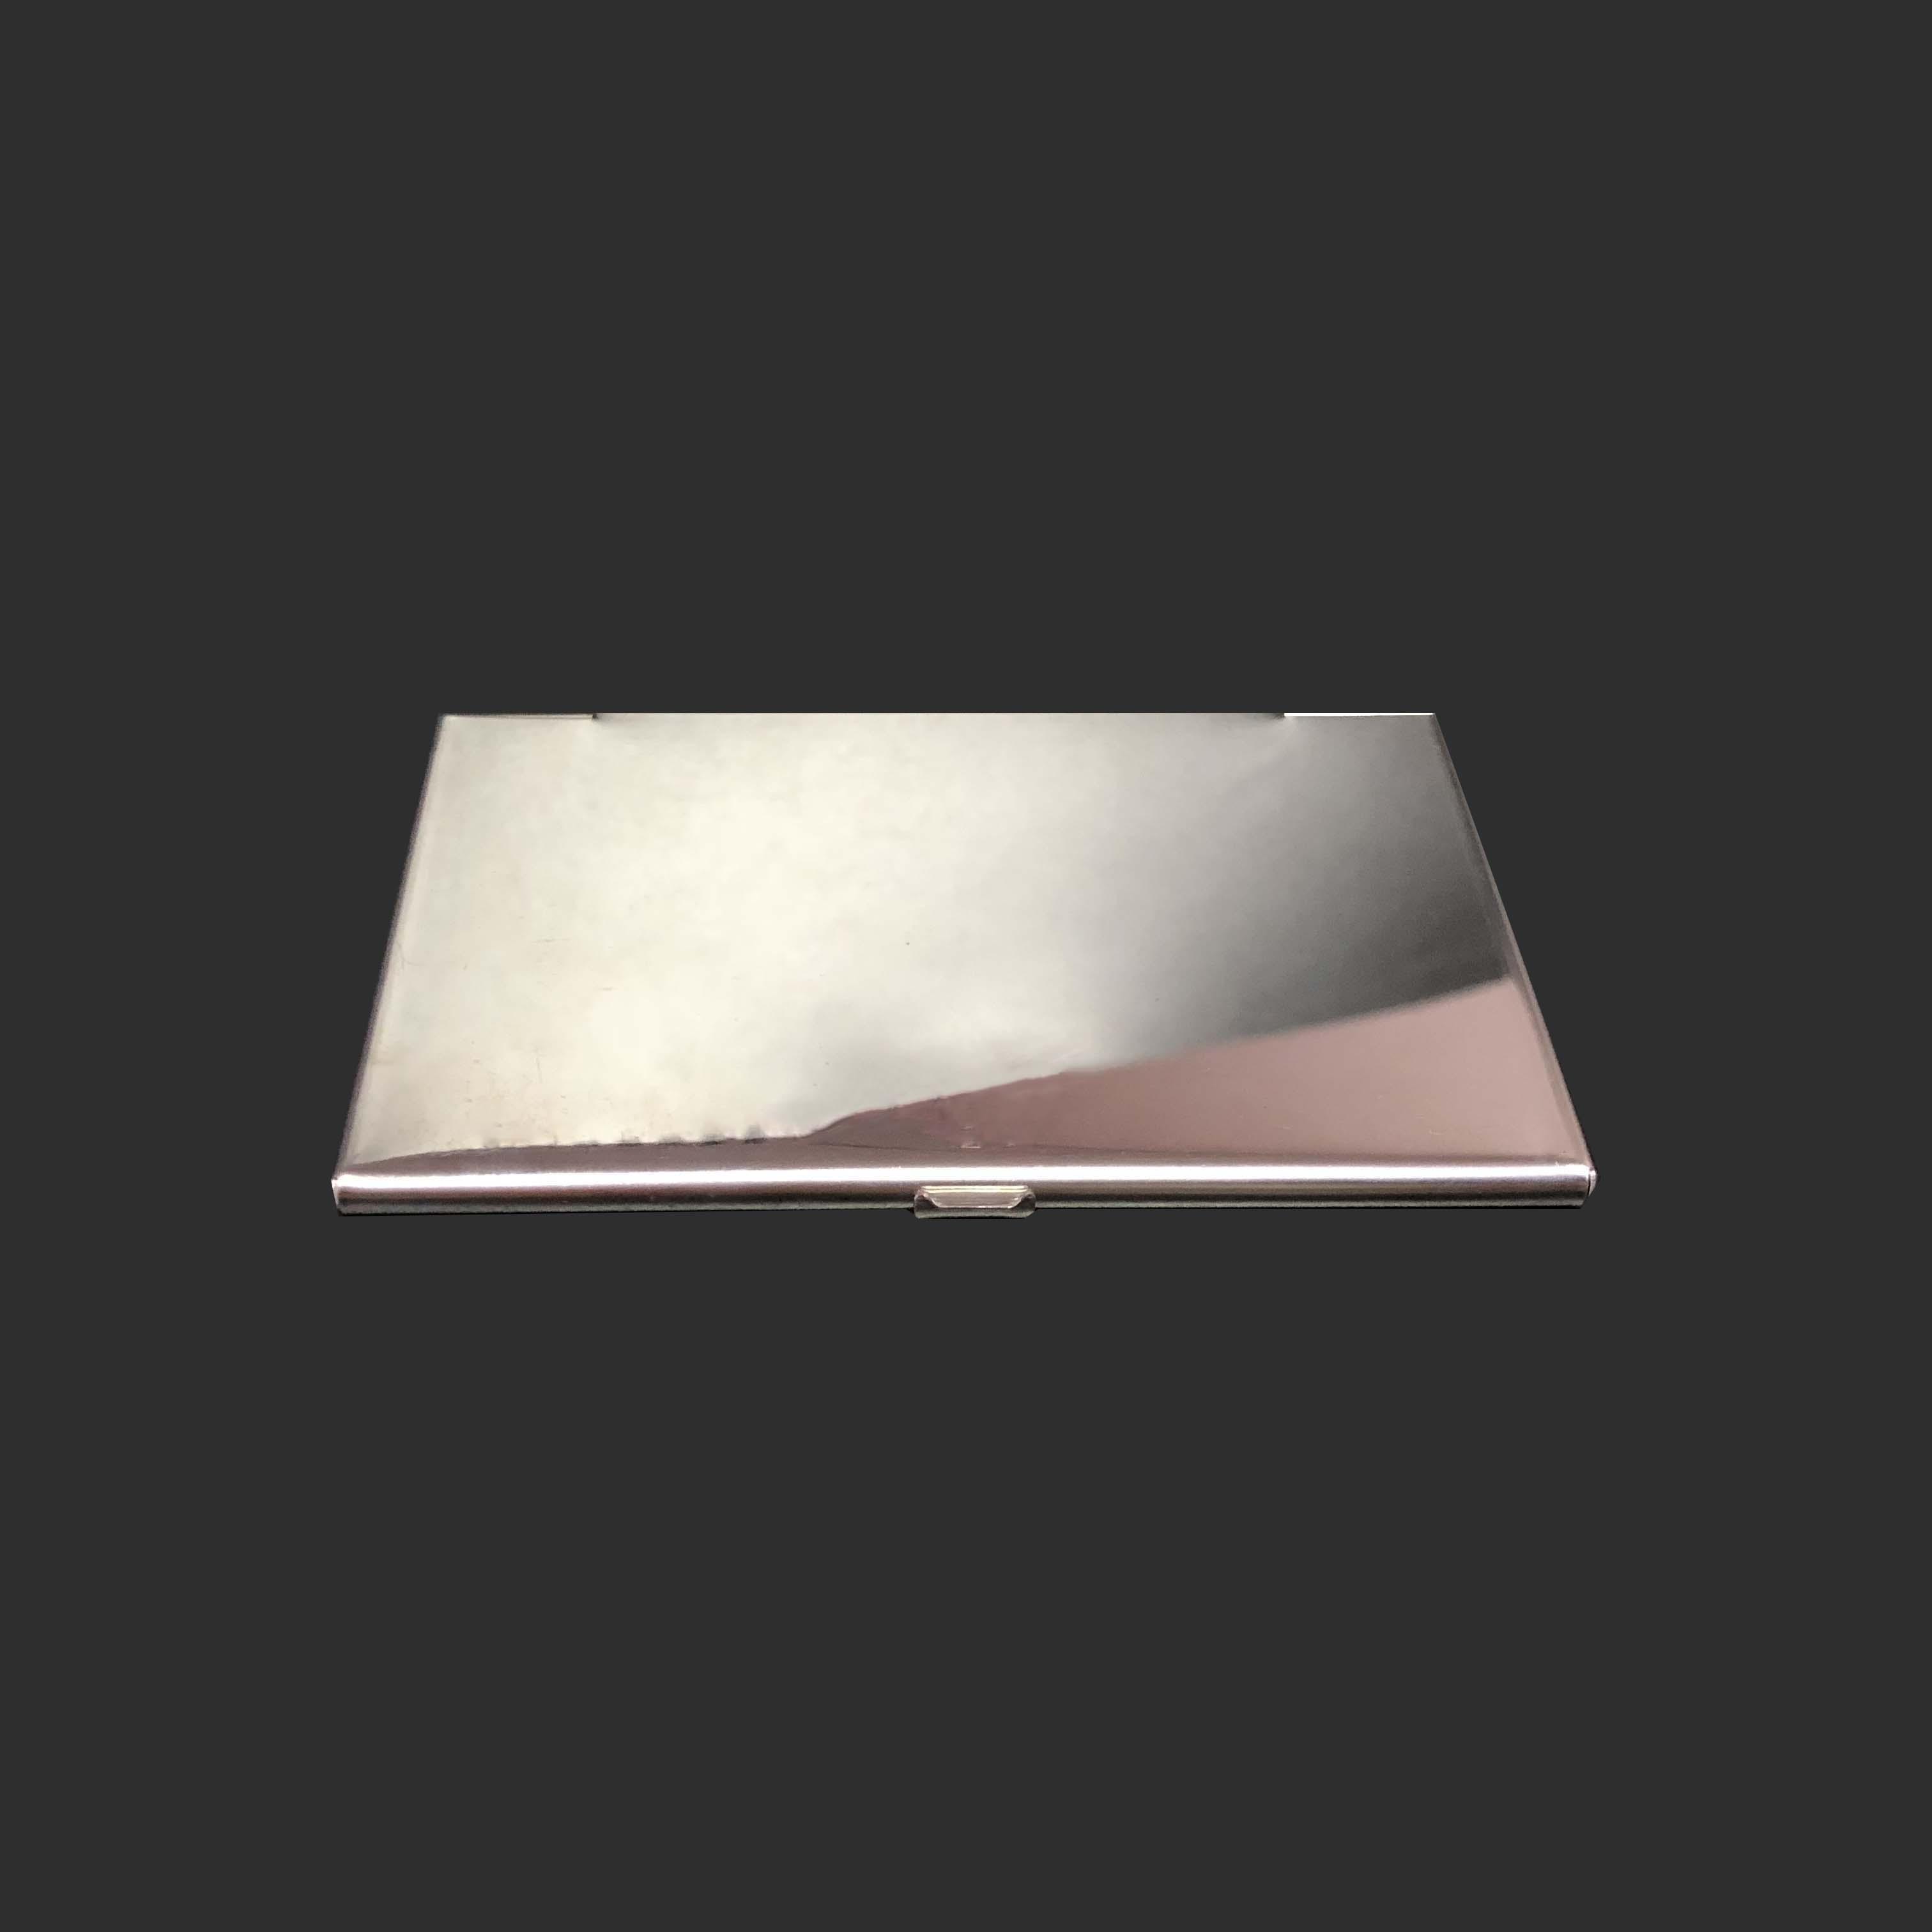 Ipromo Array image4